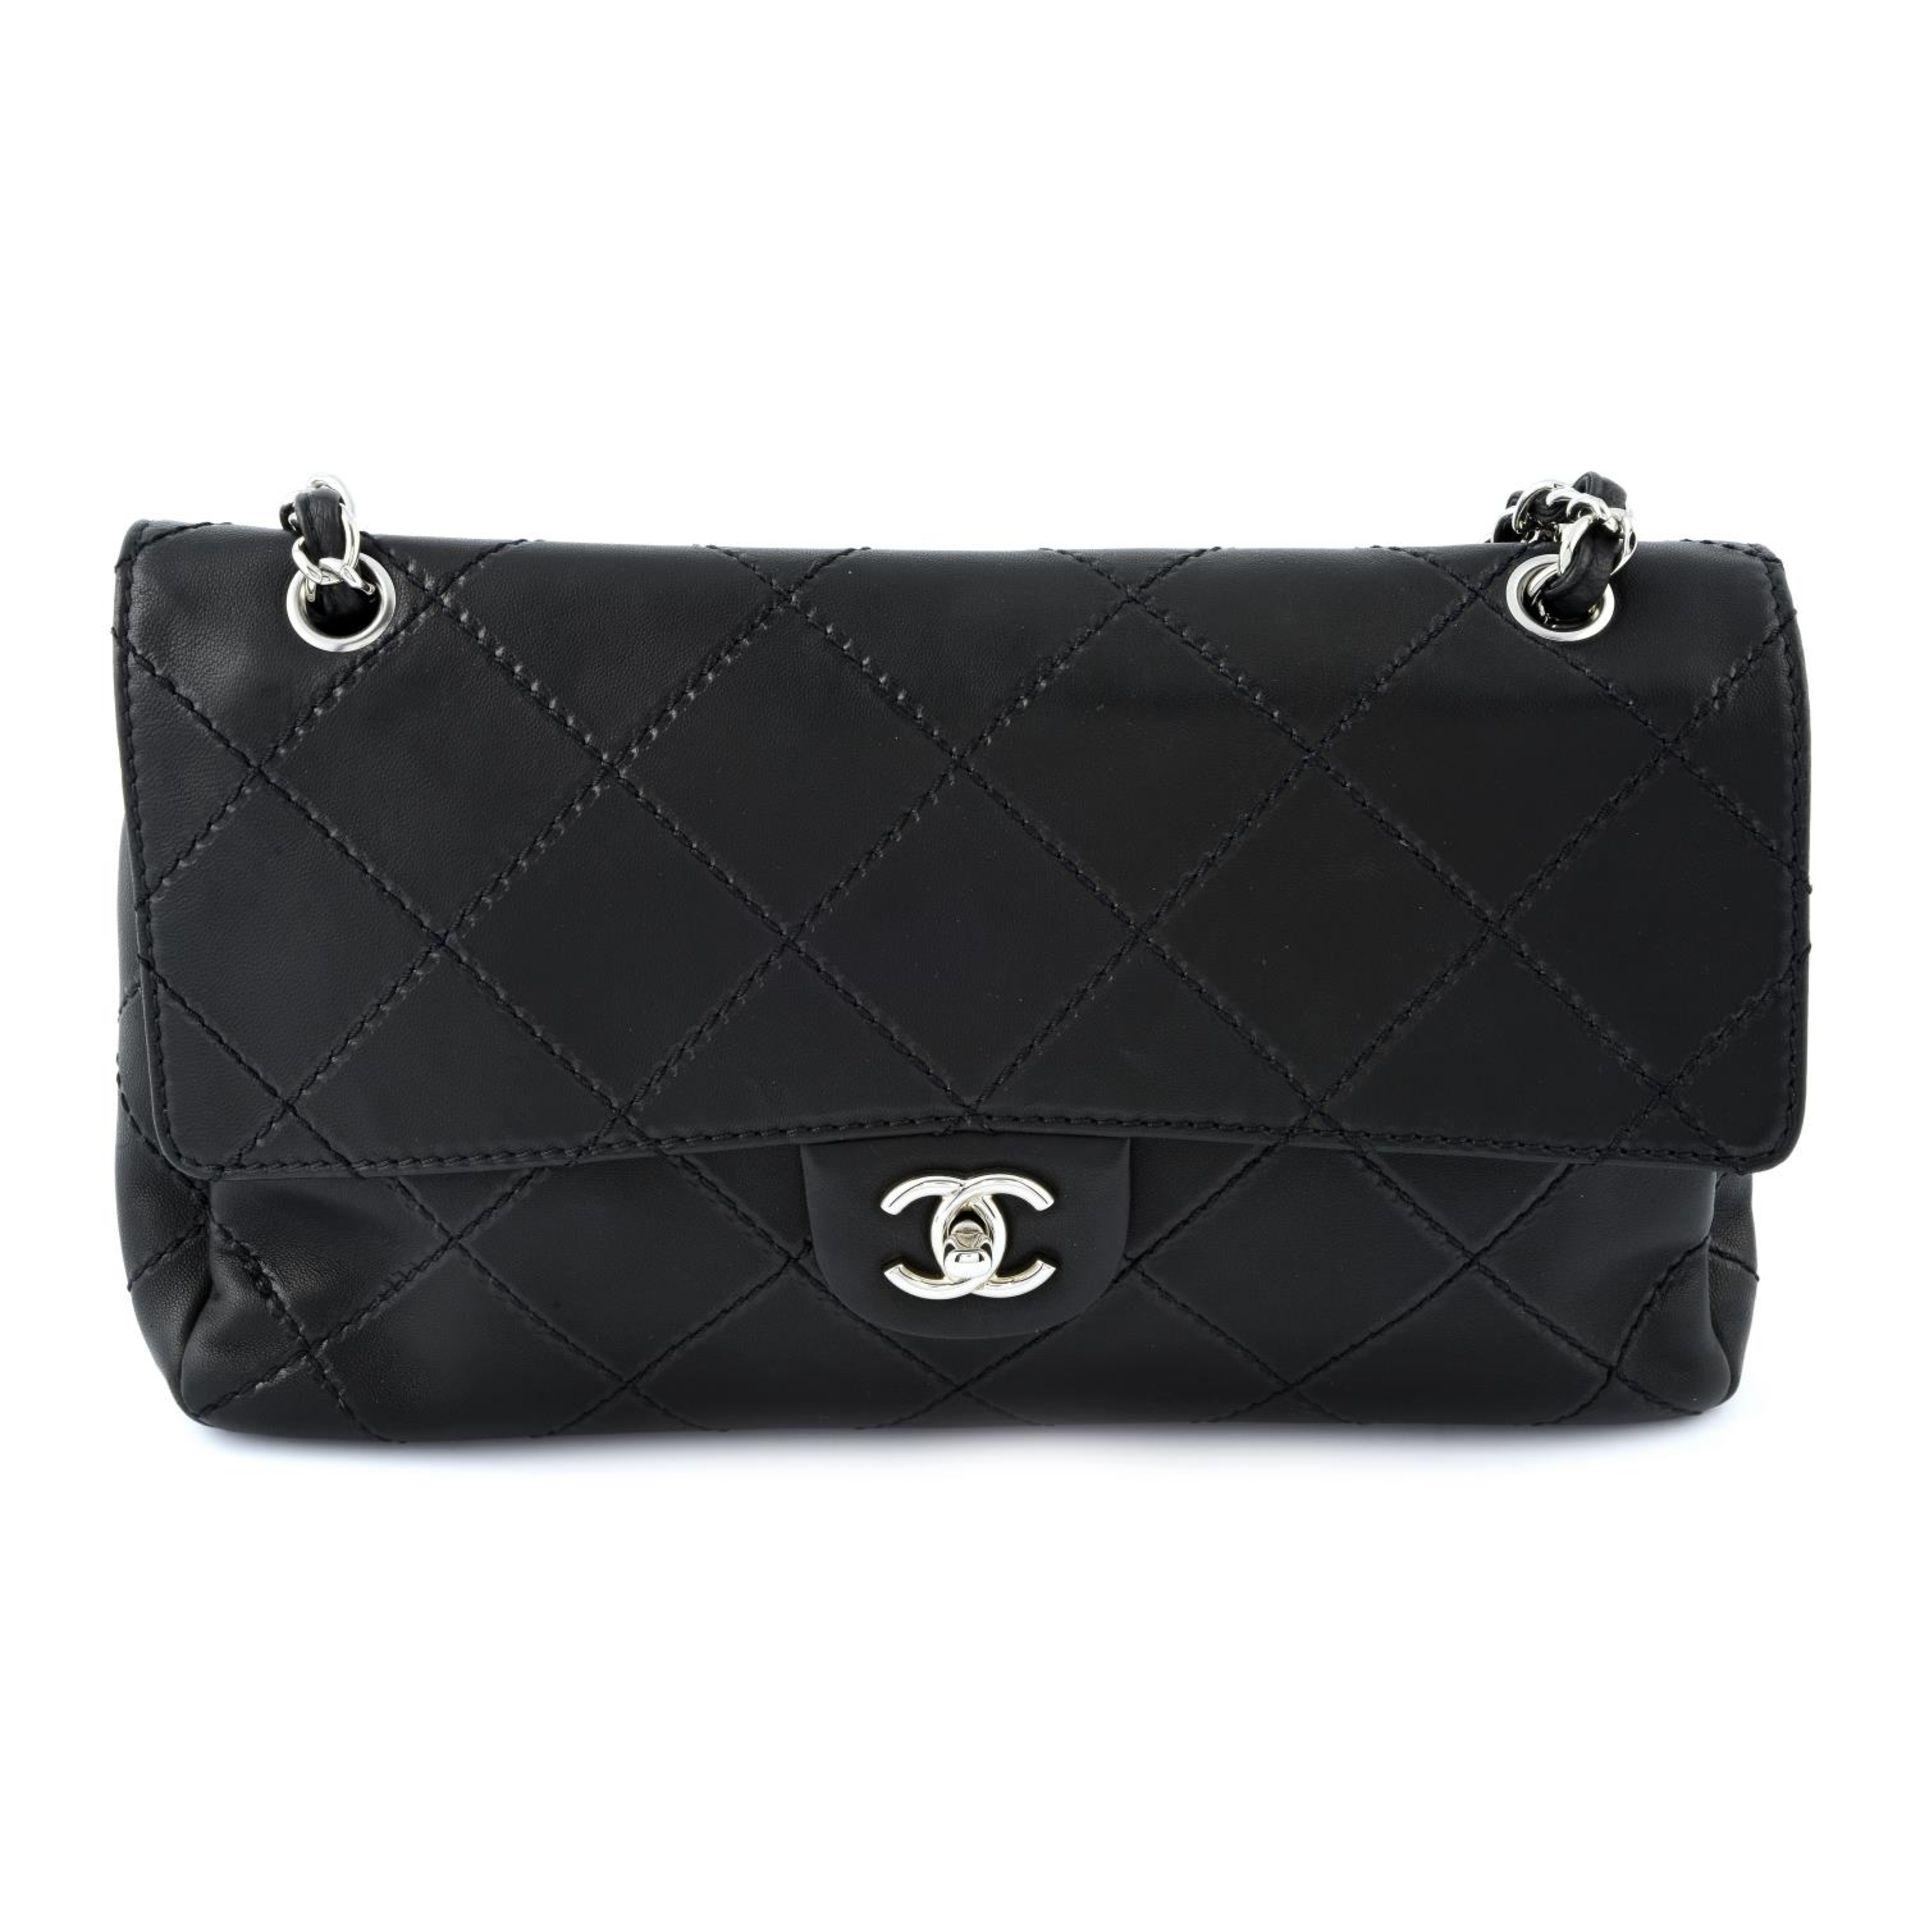 CHANEL - a maxi single flap handbag.